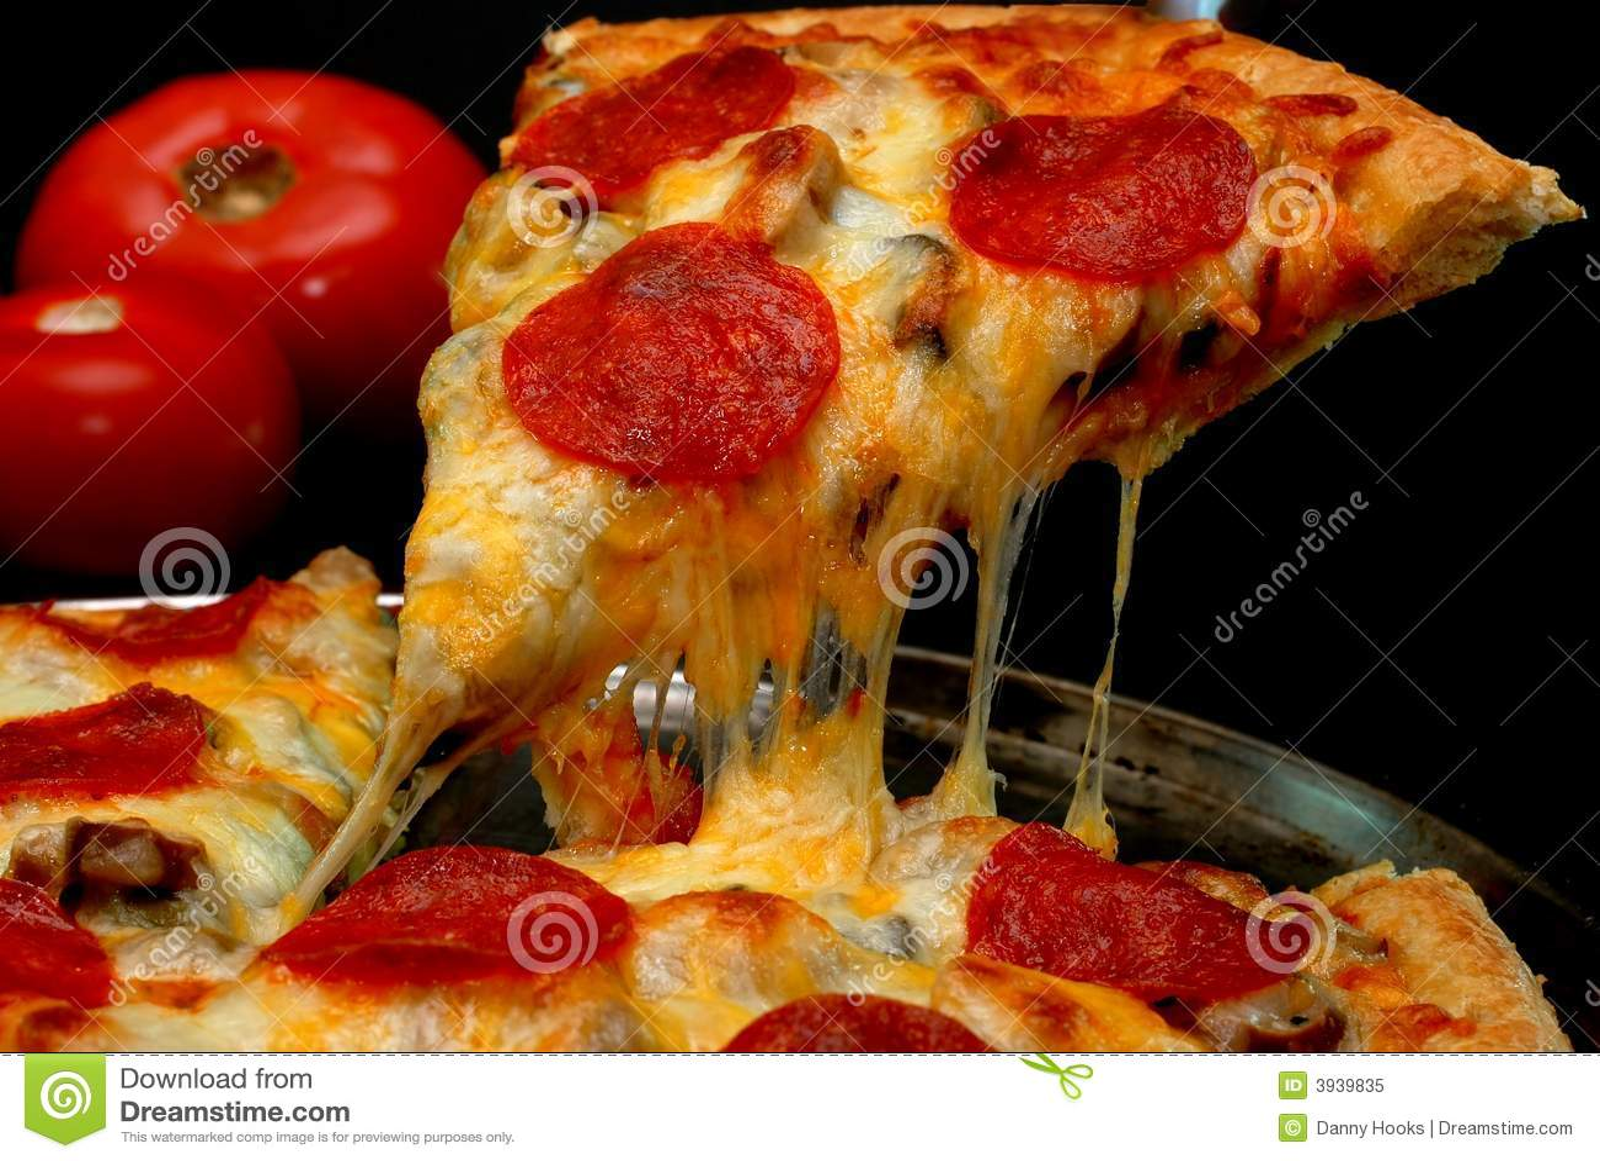 Rebanada de la pizza de salchichones